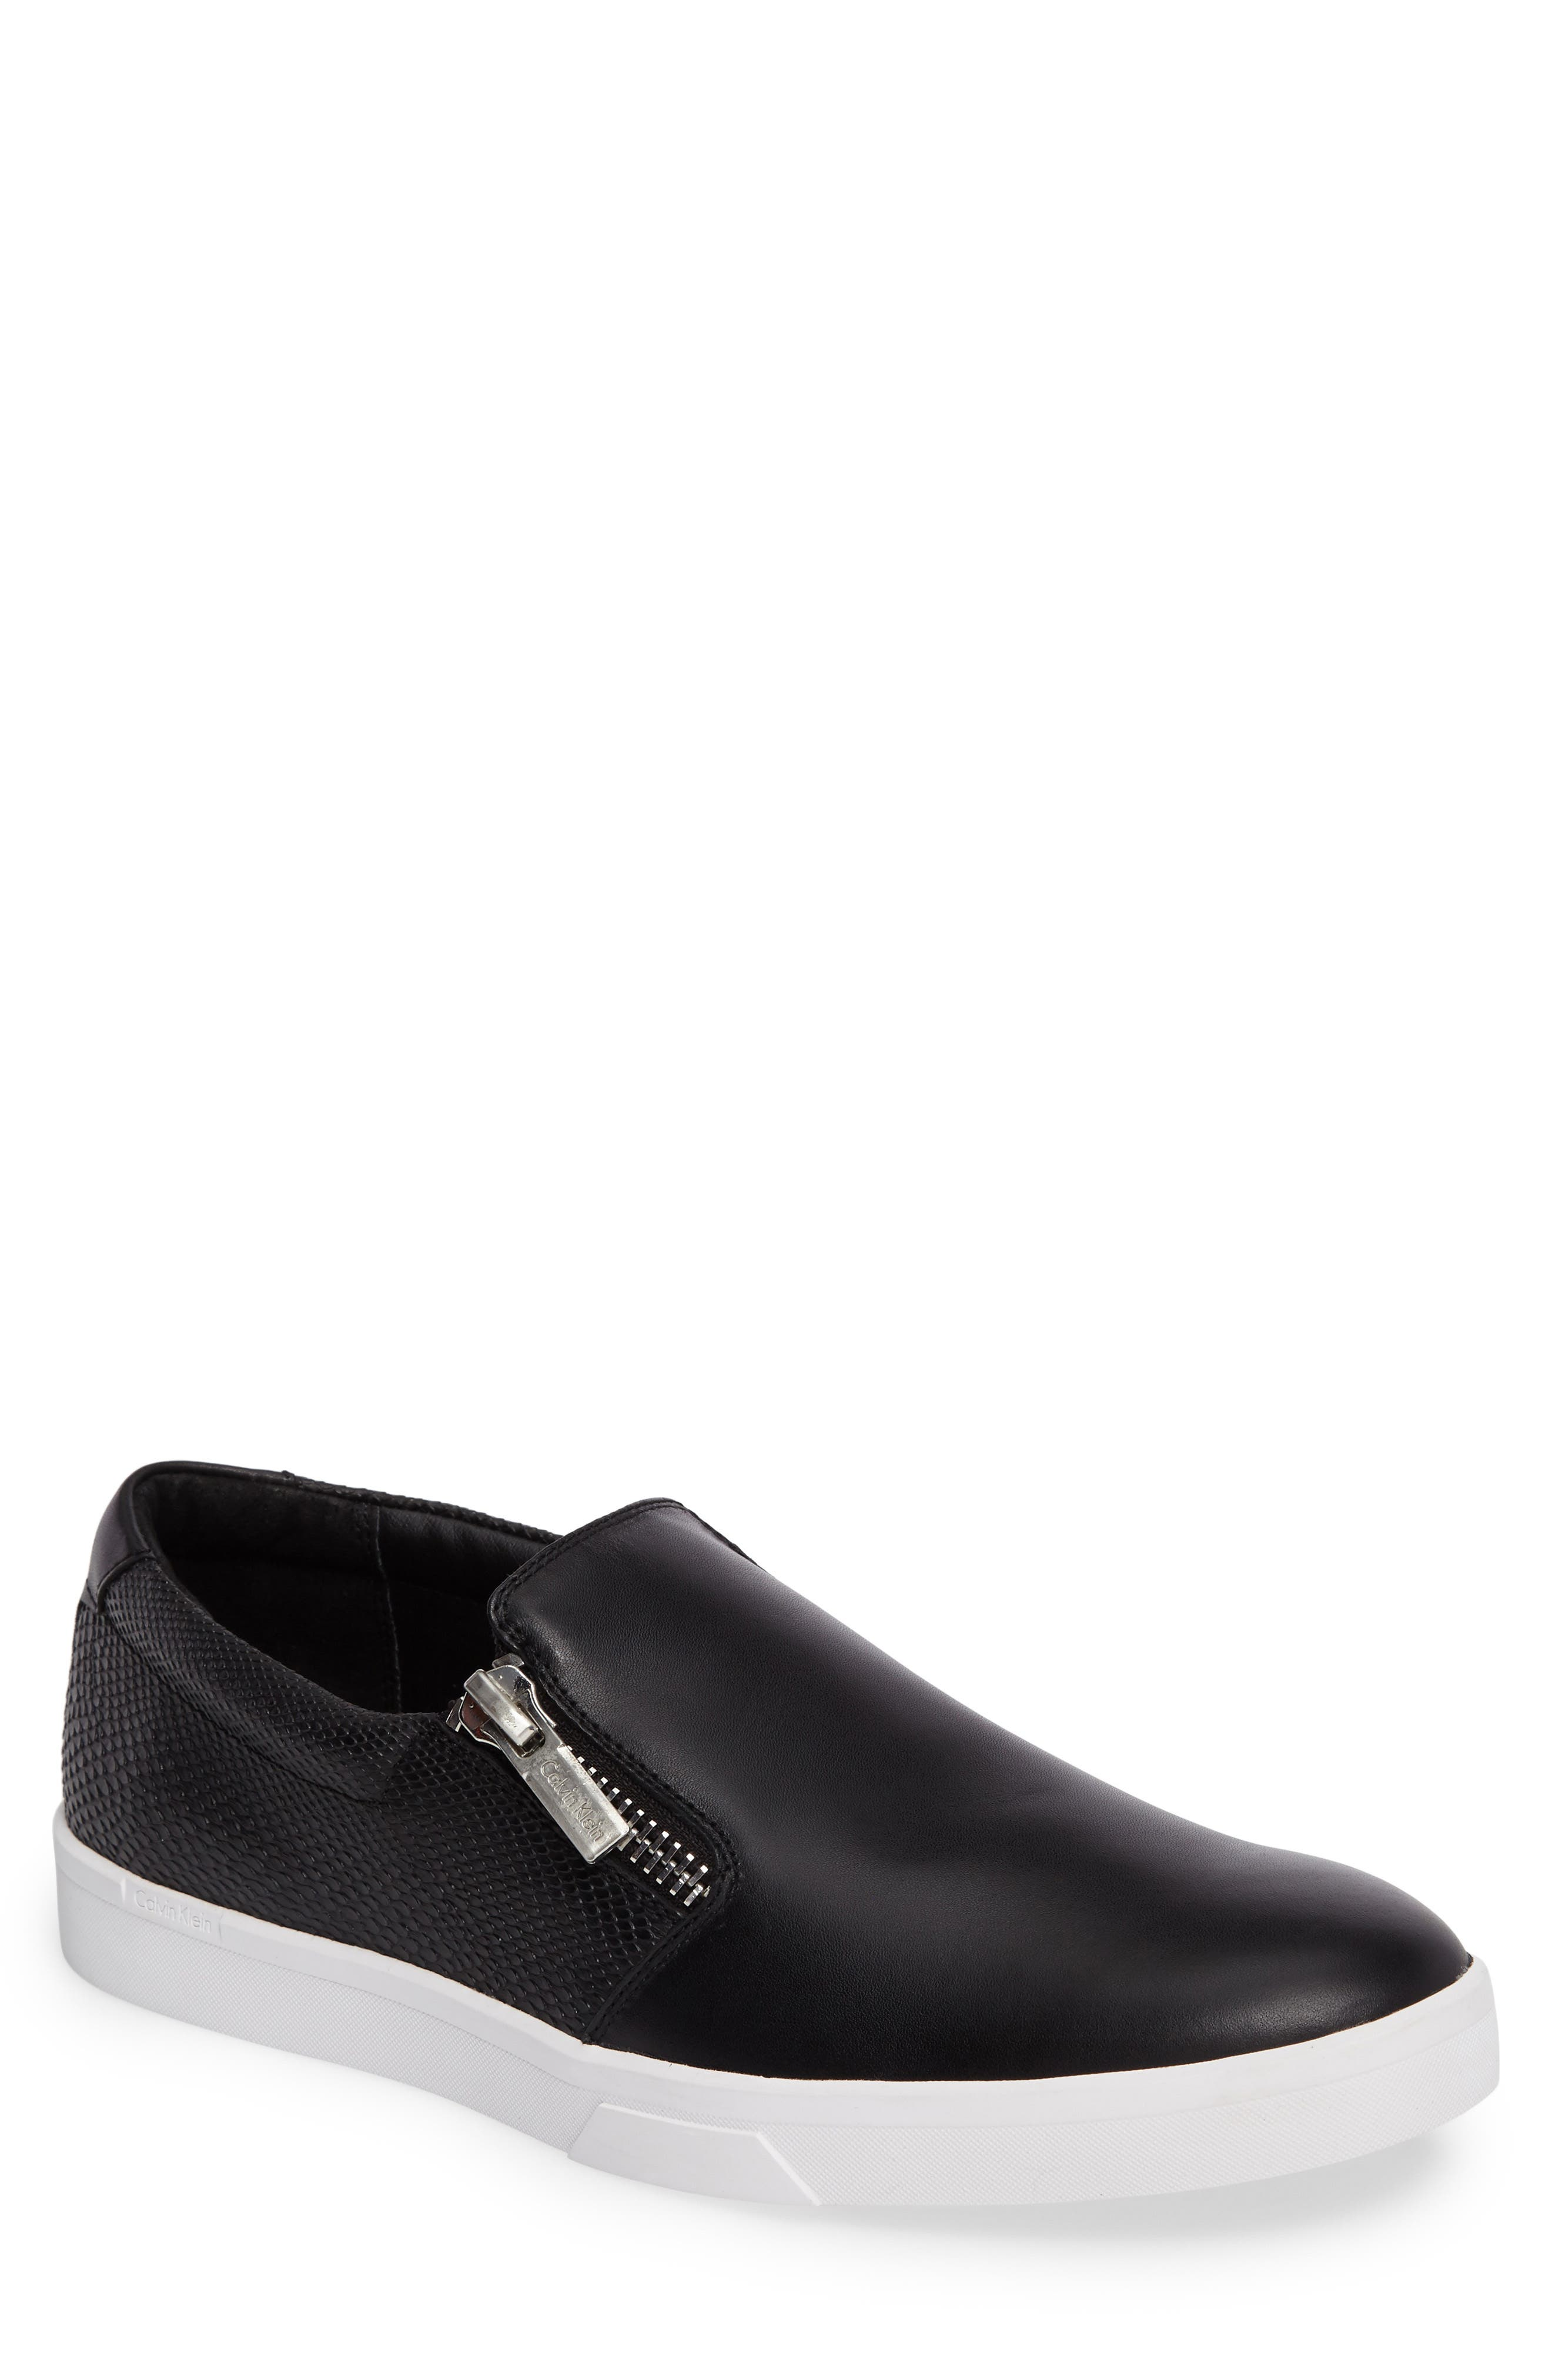 Alternate Image 1 Selected - Calvin Klein Ibiza Slip-On Zip Sneaker (Men)